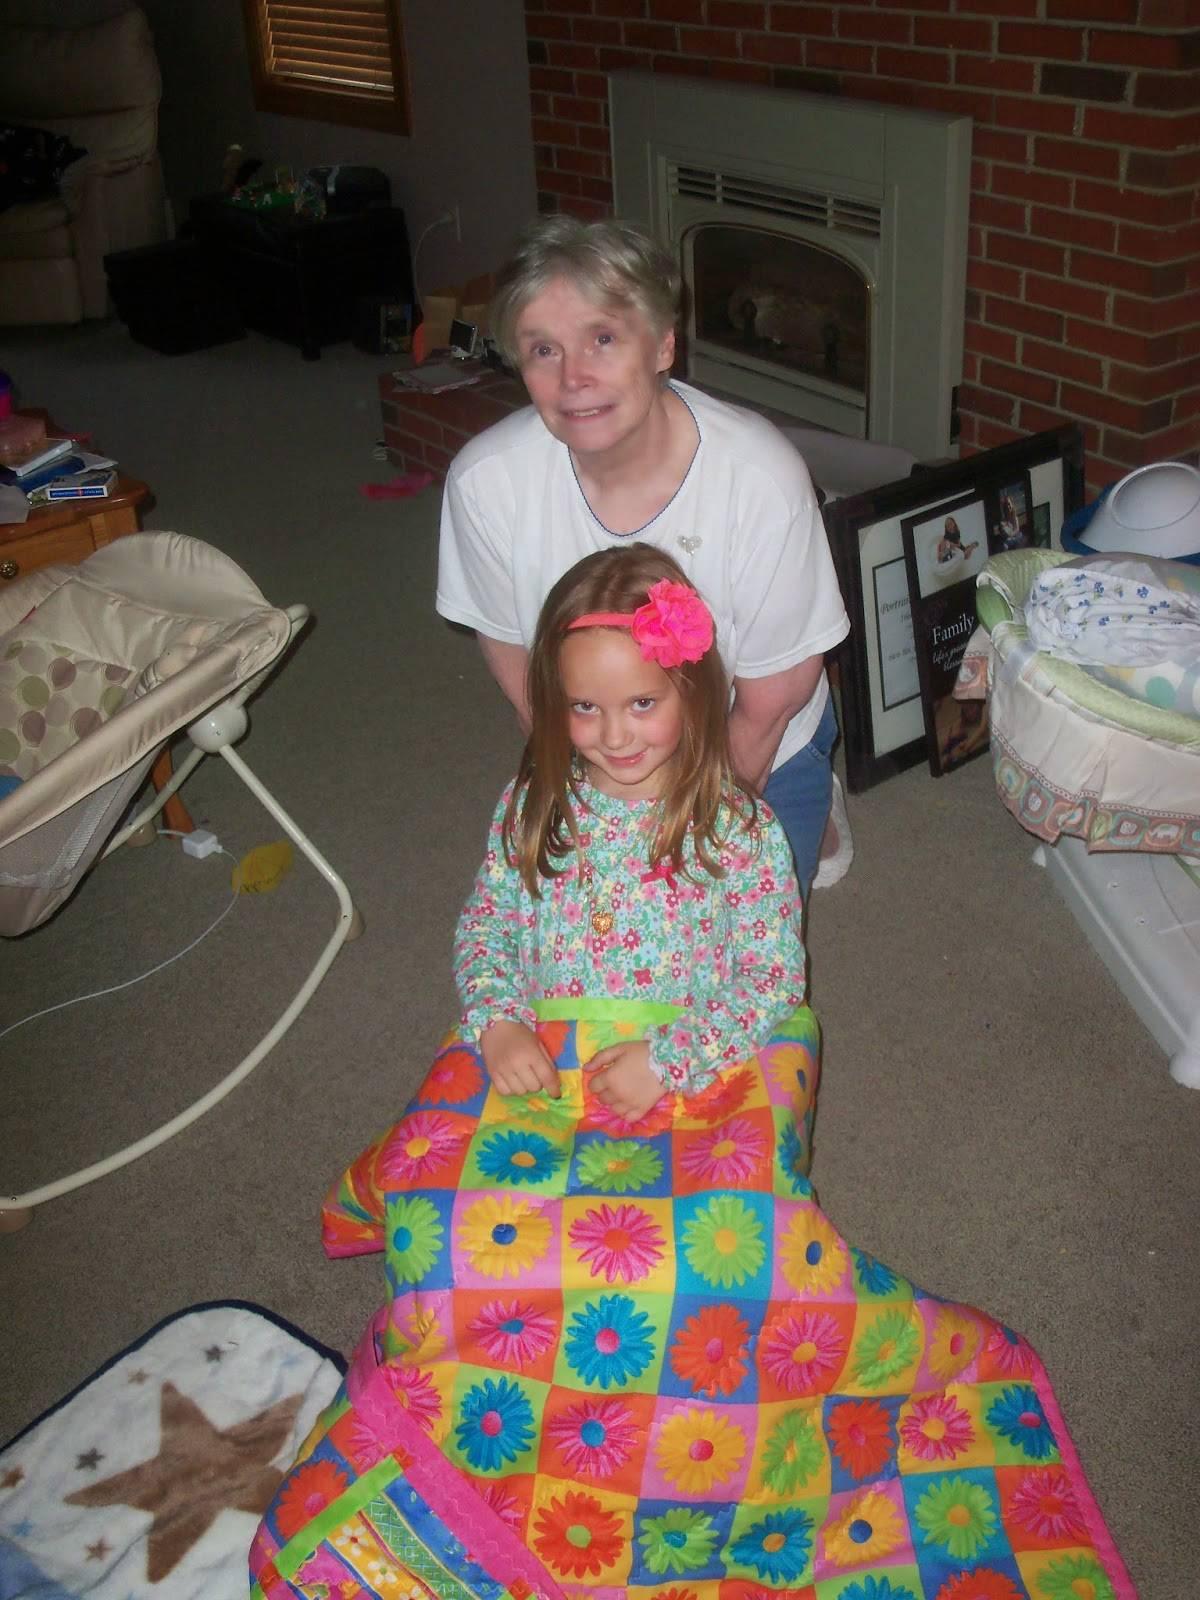 Eighth: Zoe's Crazy Daisy Quilt